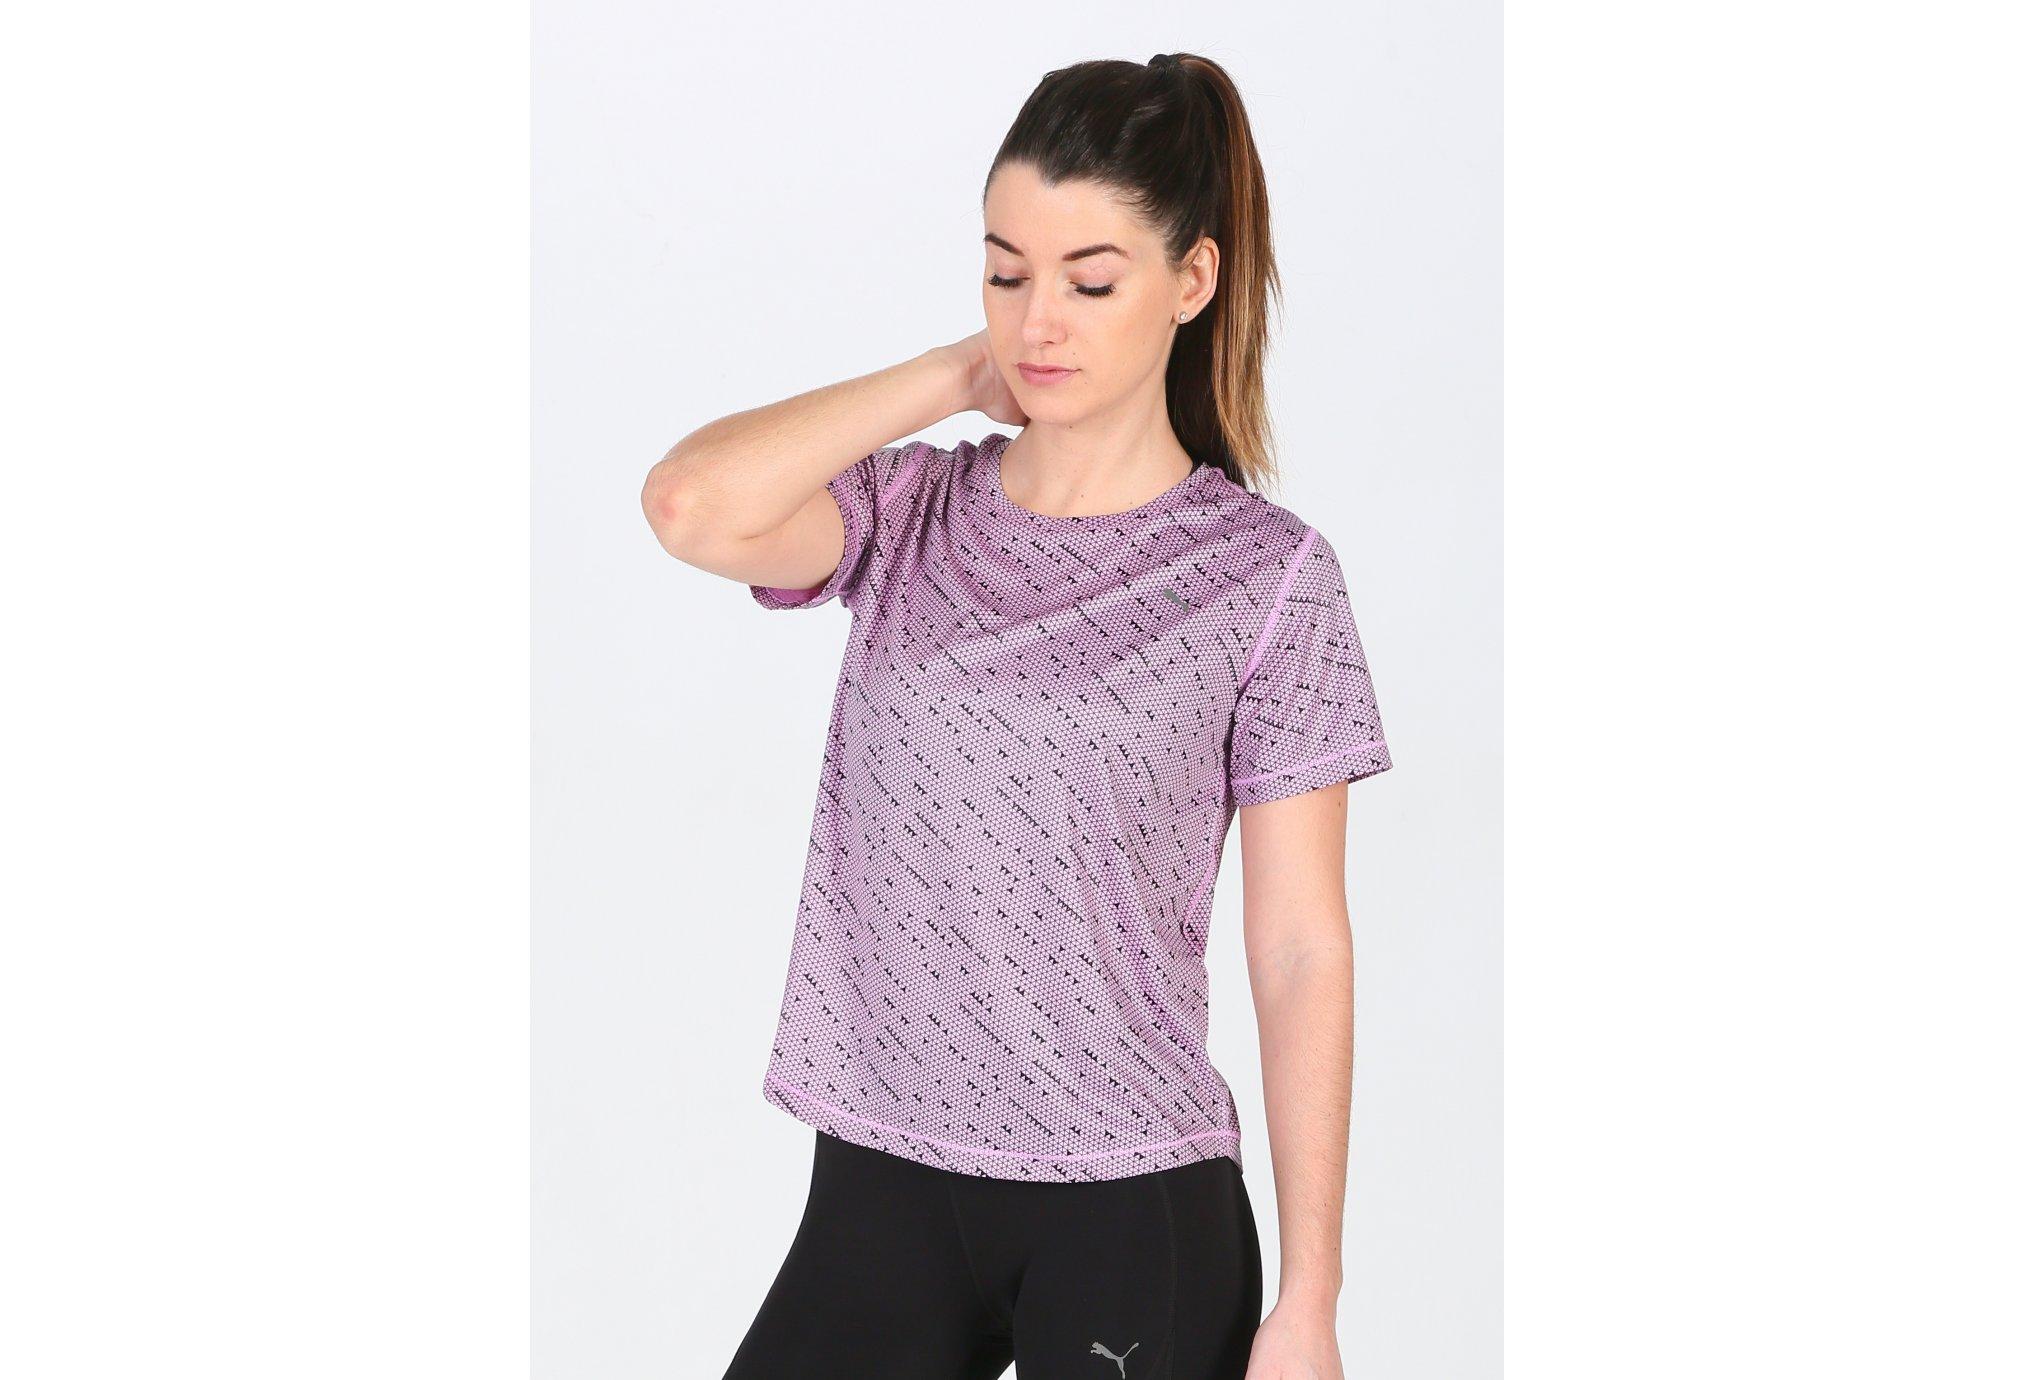 Puma S/S Ignite Graphic W vêtement running femme